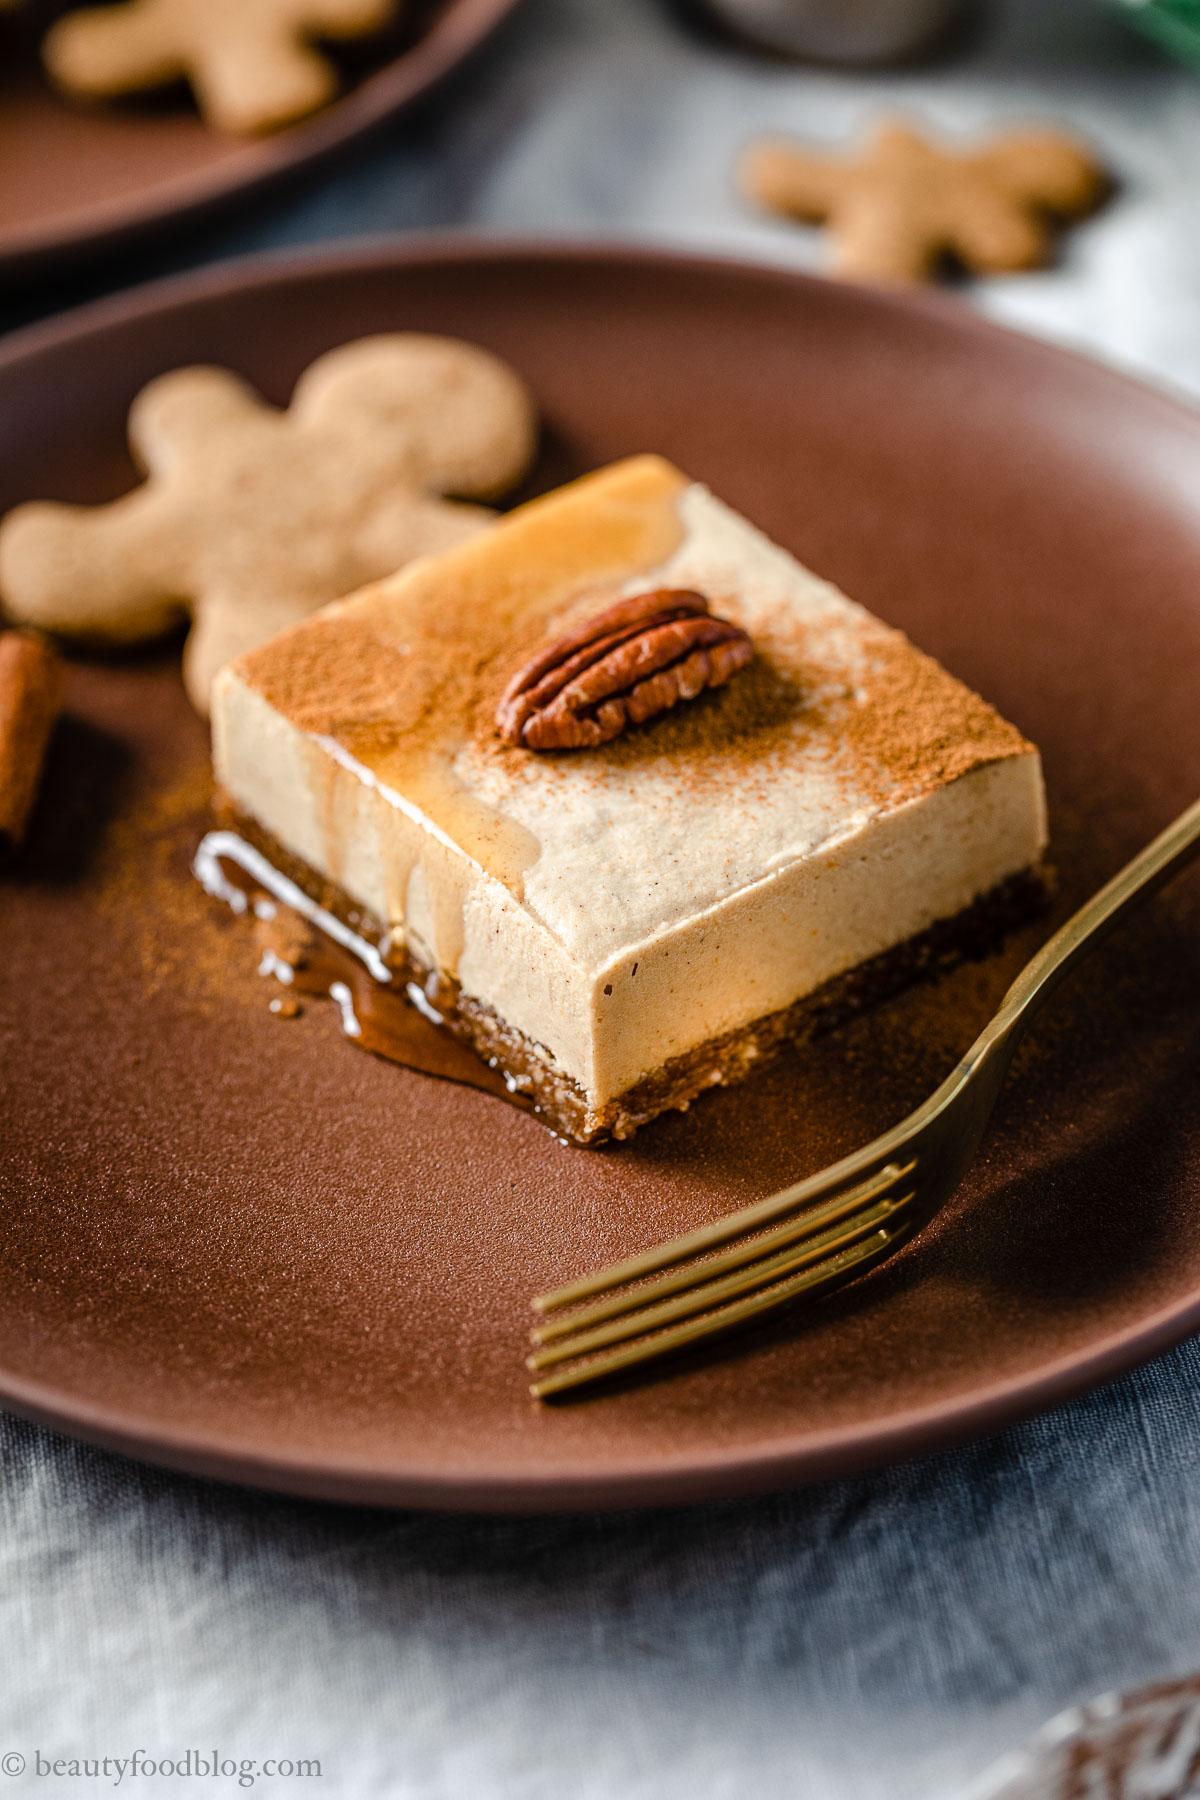 ricetta cremosa cheesecake al pan di zenzero senza cottura creamy gluten-free vegan no-bake gingerbread cheesecake